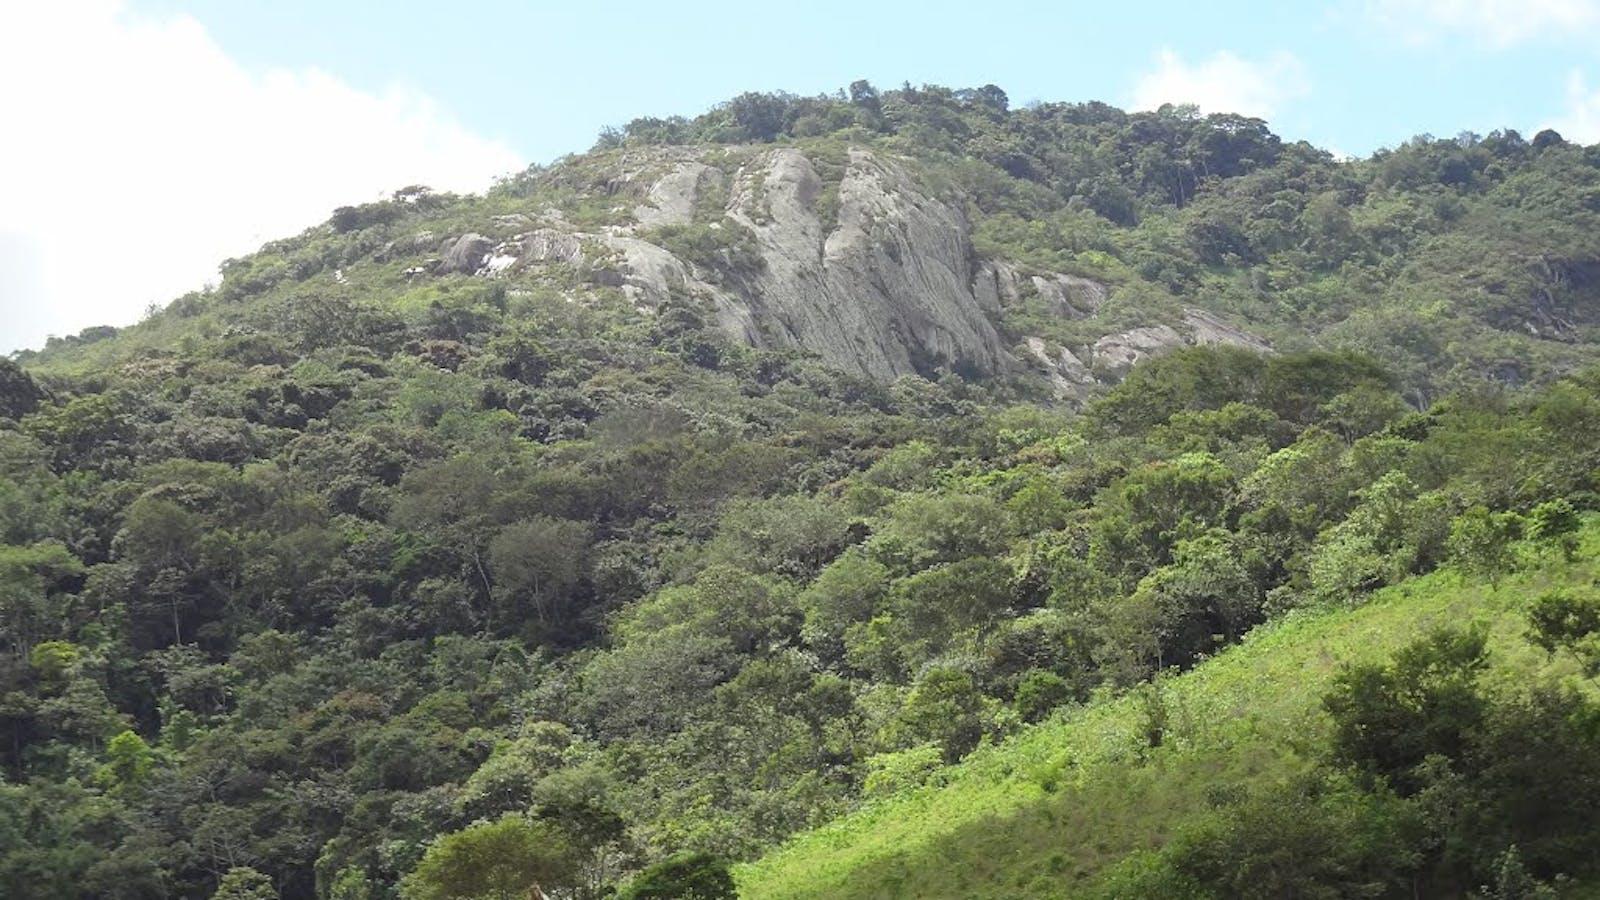 Pernambuco Interior Forests